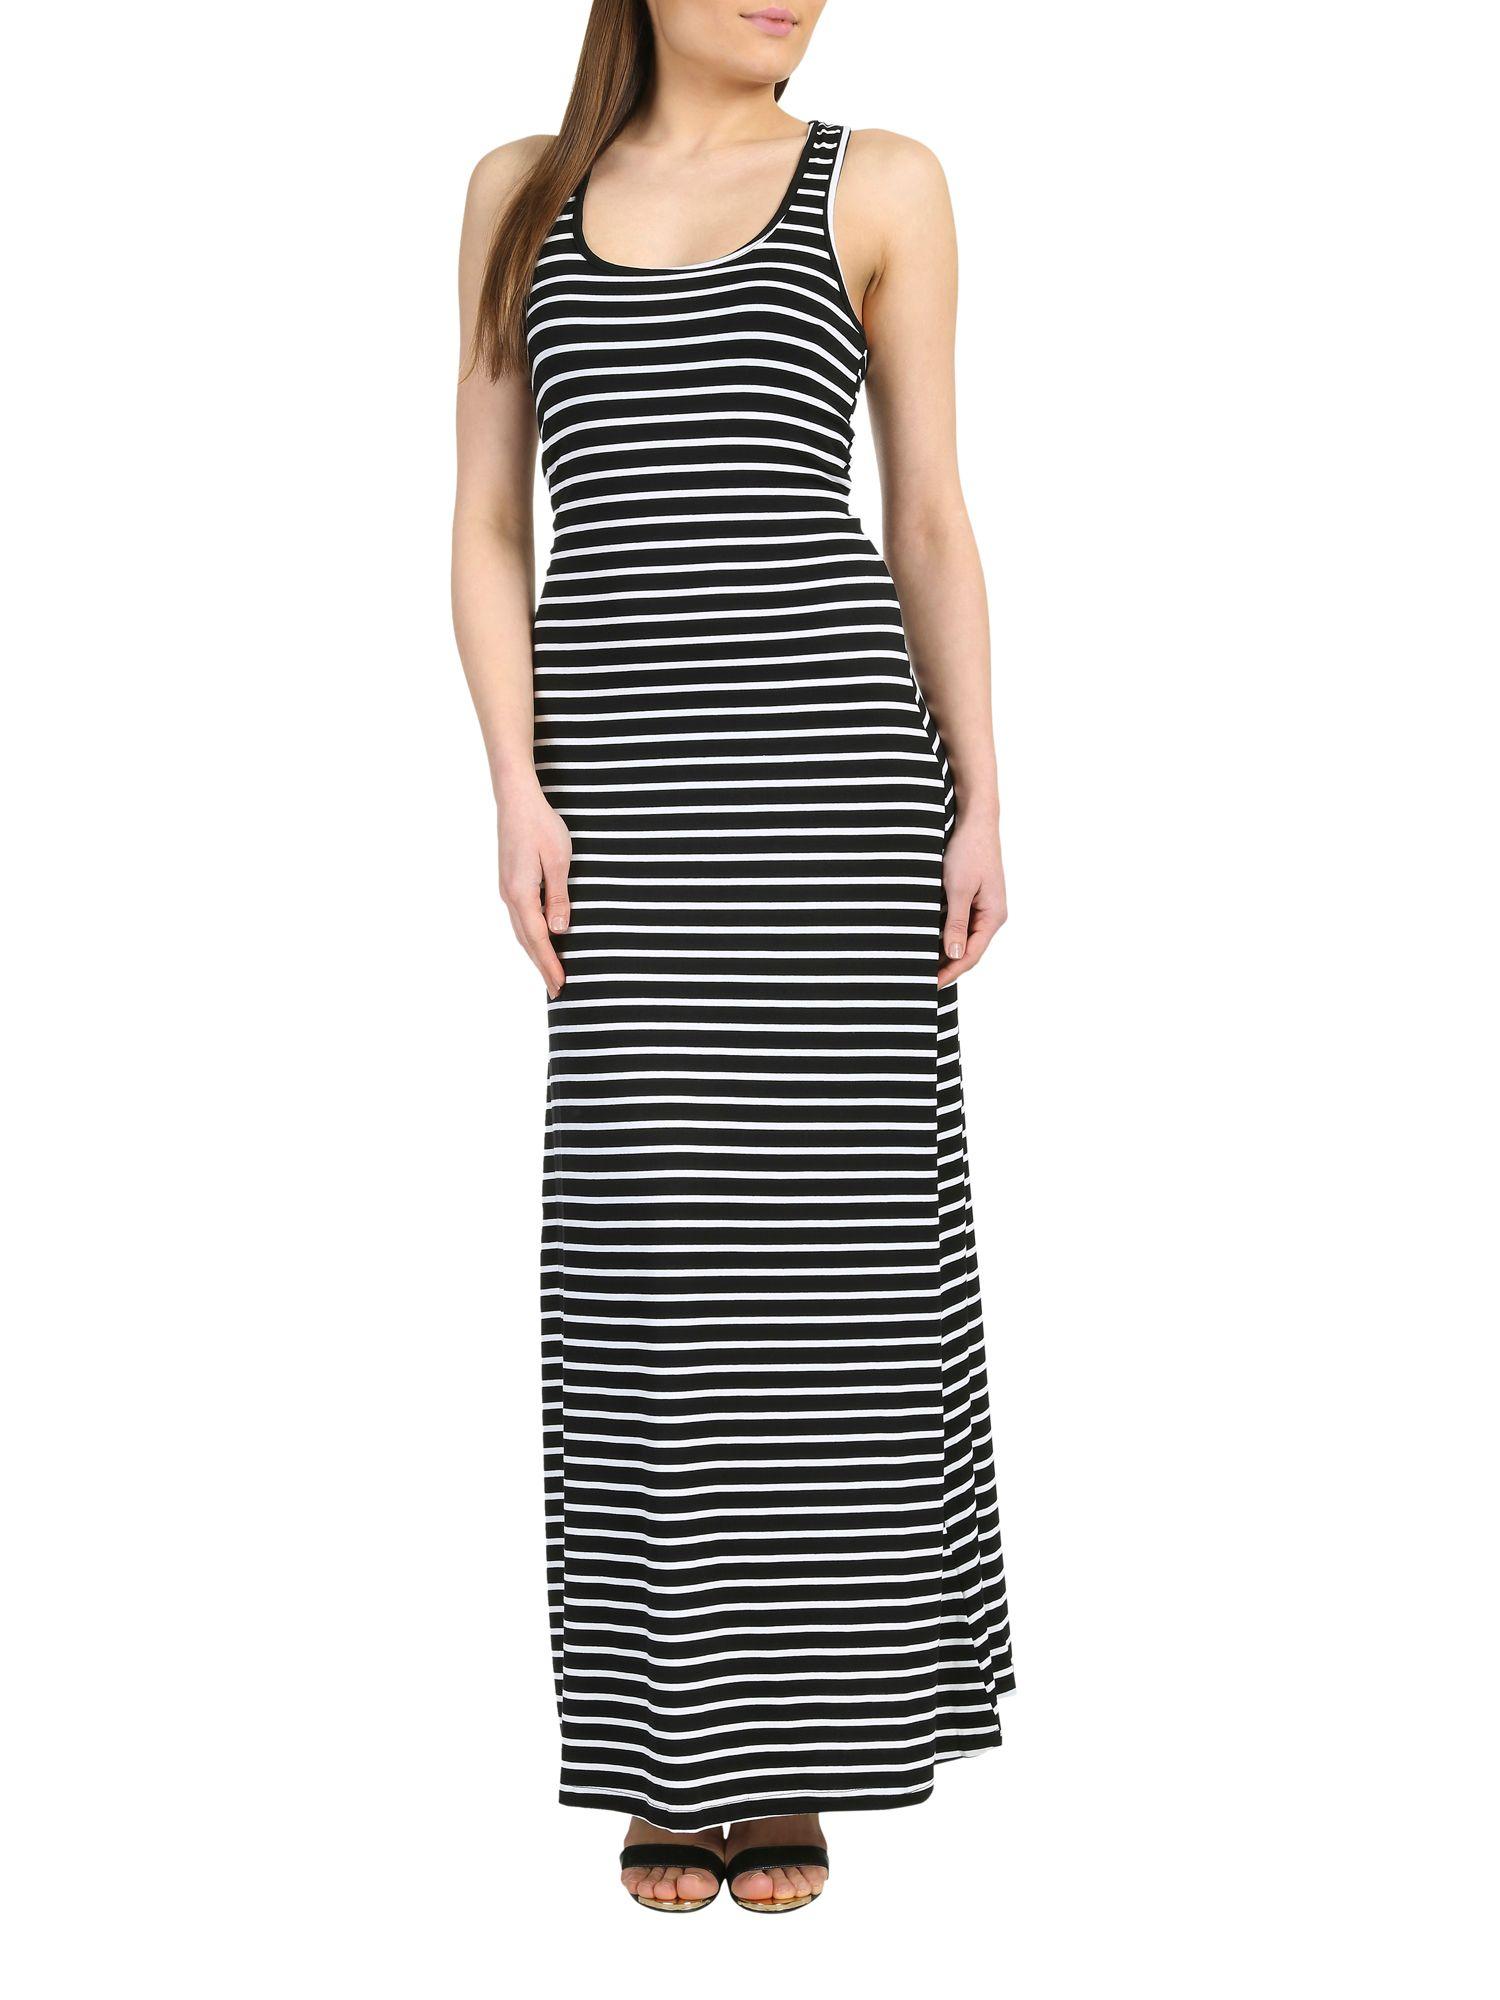 Horizontal Striped Maxi Dress with Cap Sleeve